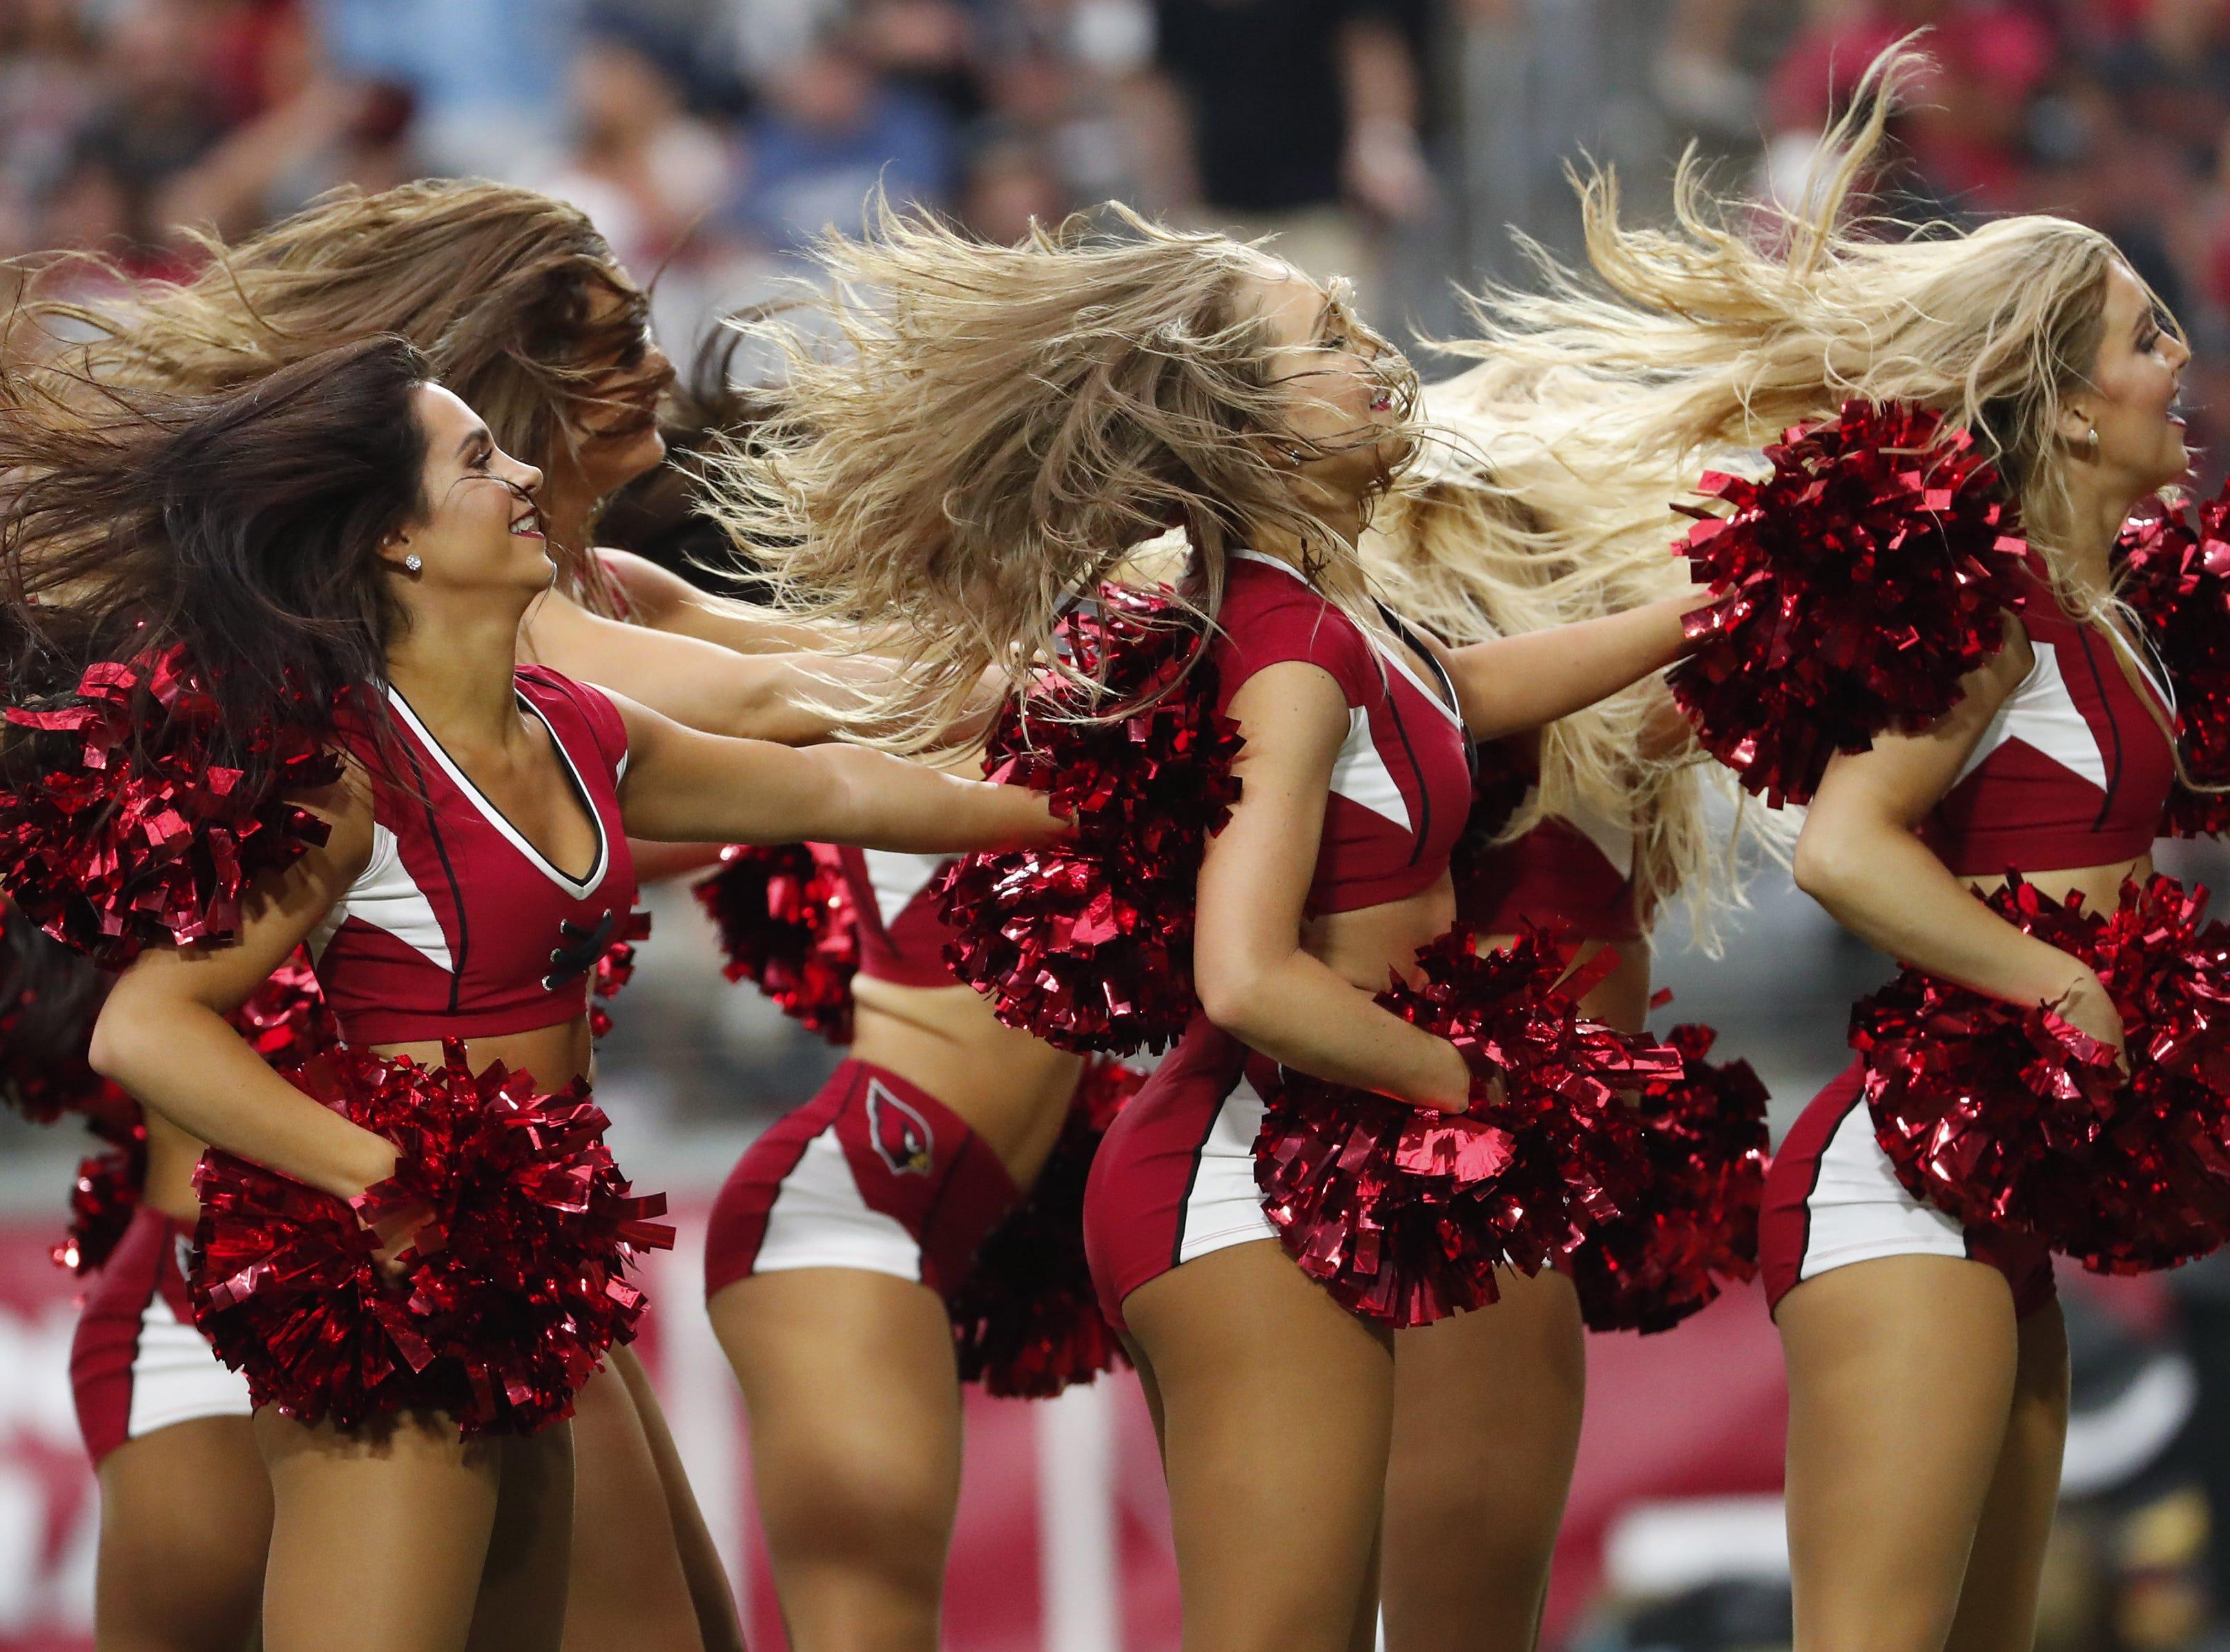 Arizona Cardinals cheerleaders perform during a break against the Washington Redskins at State Farm Stadium in Glendale, Ariz. on Sept. 9, 2018.